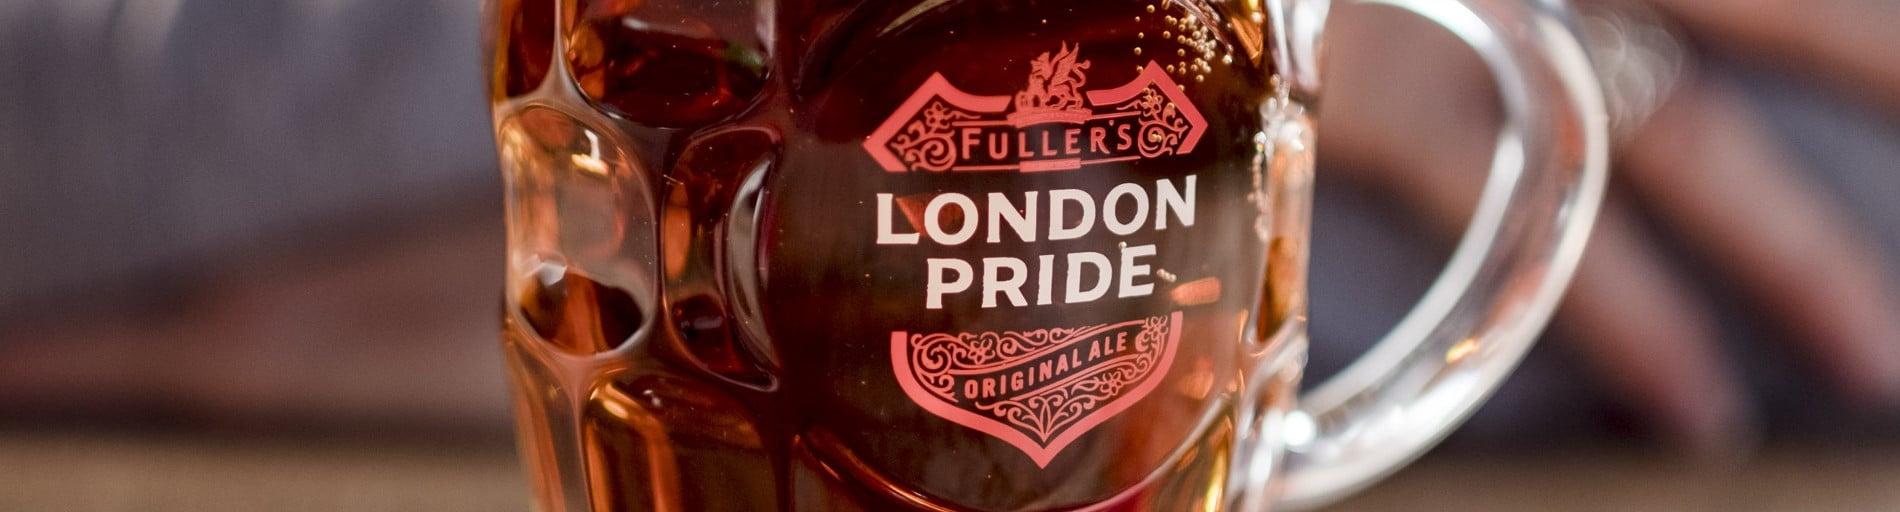 New social media campaign for London Pride